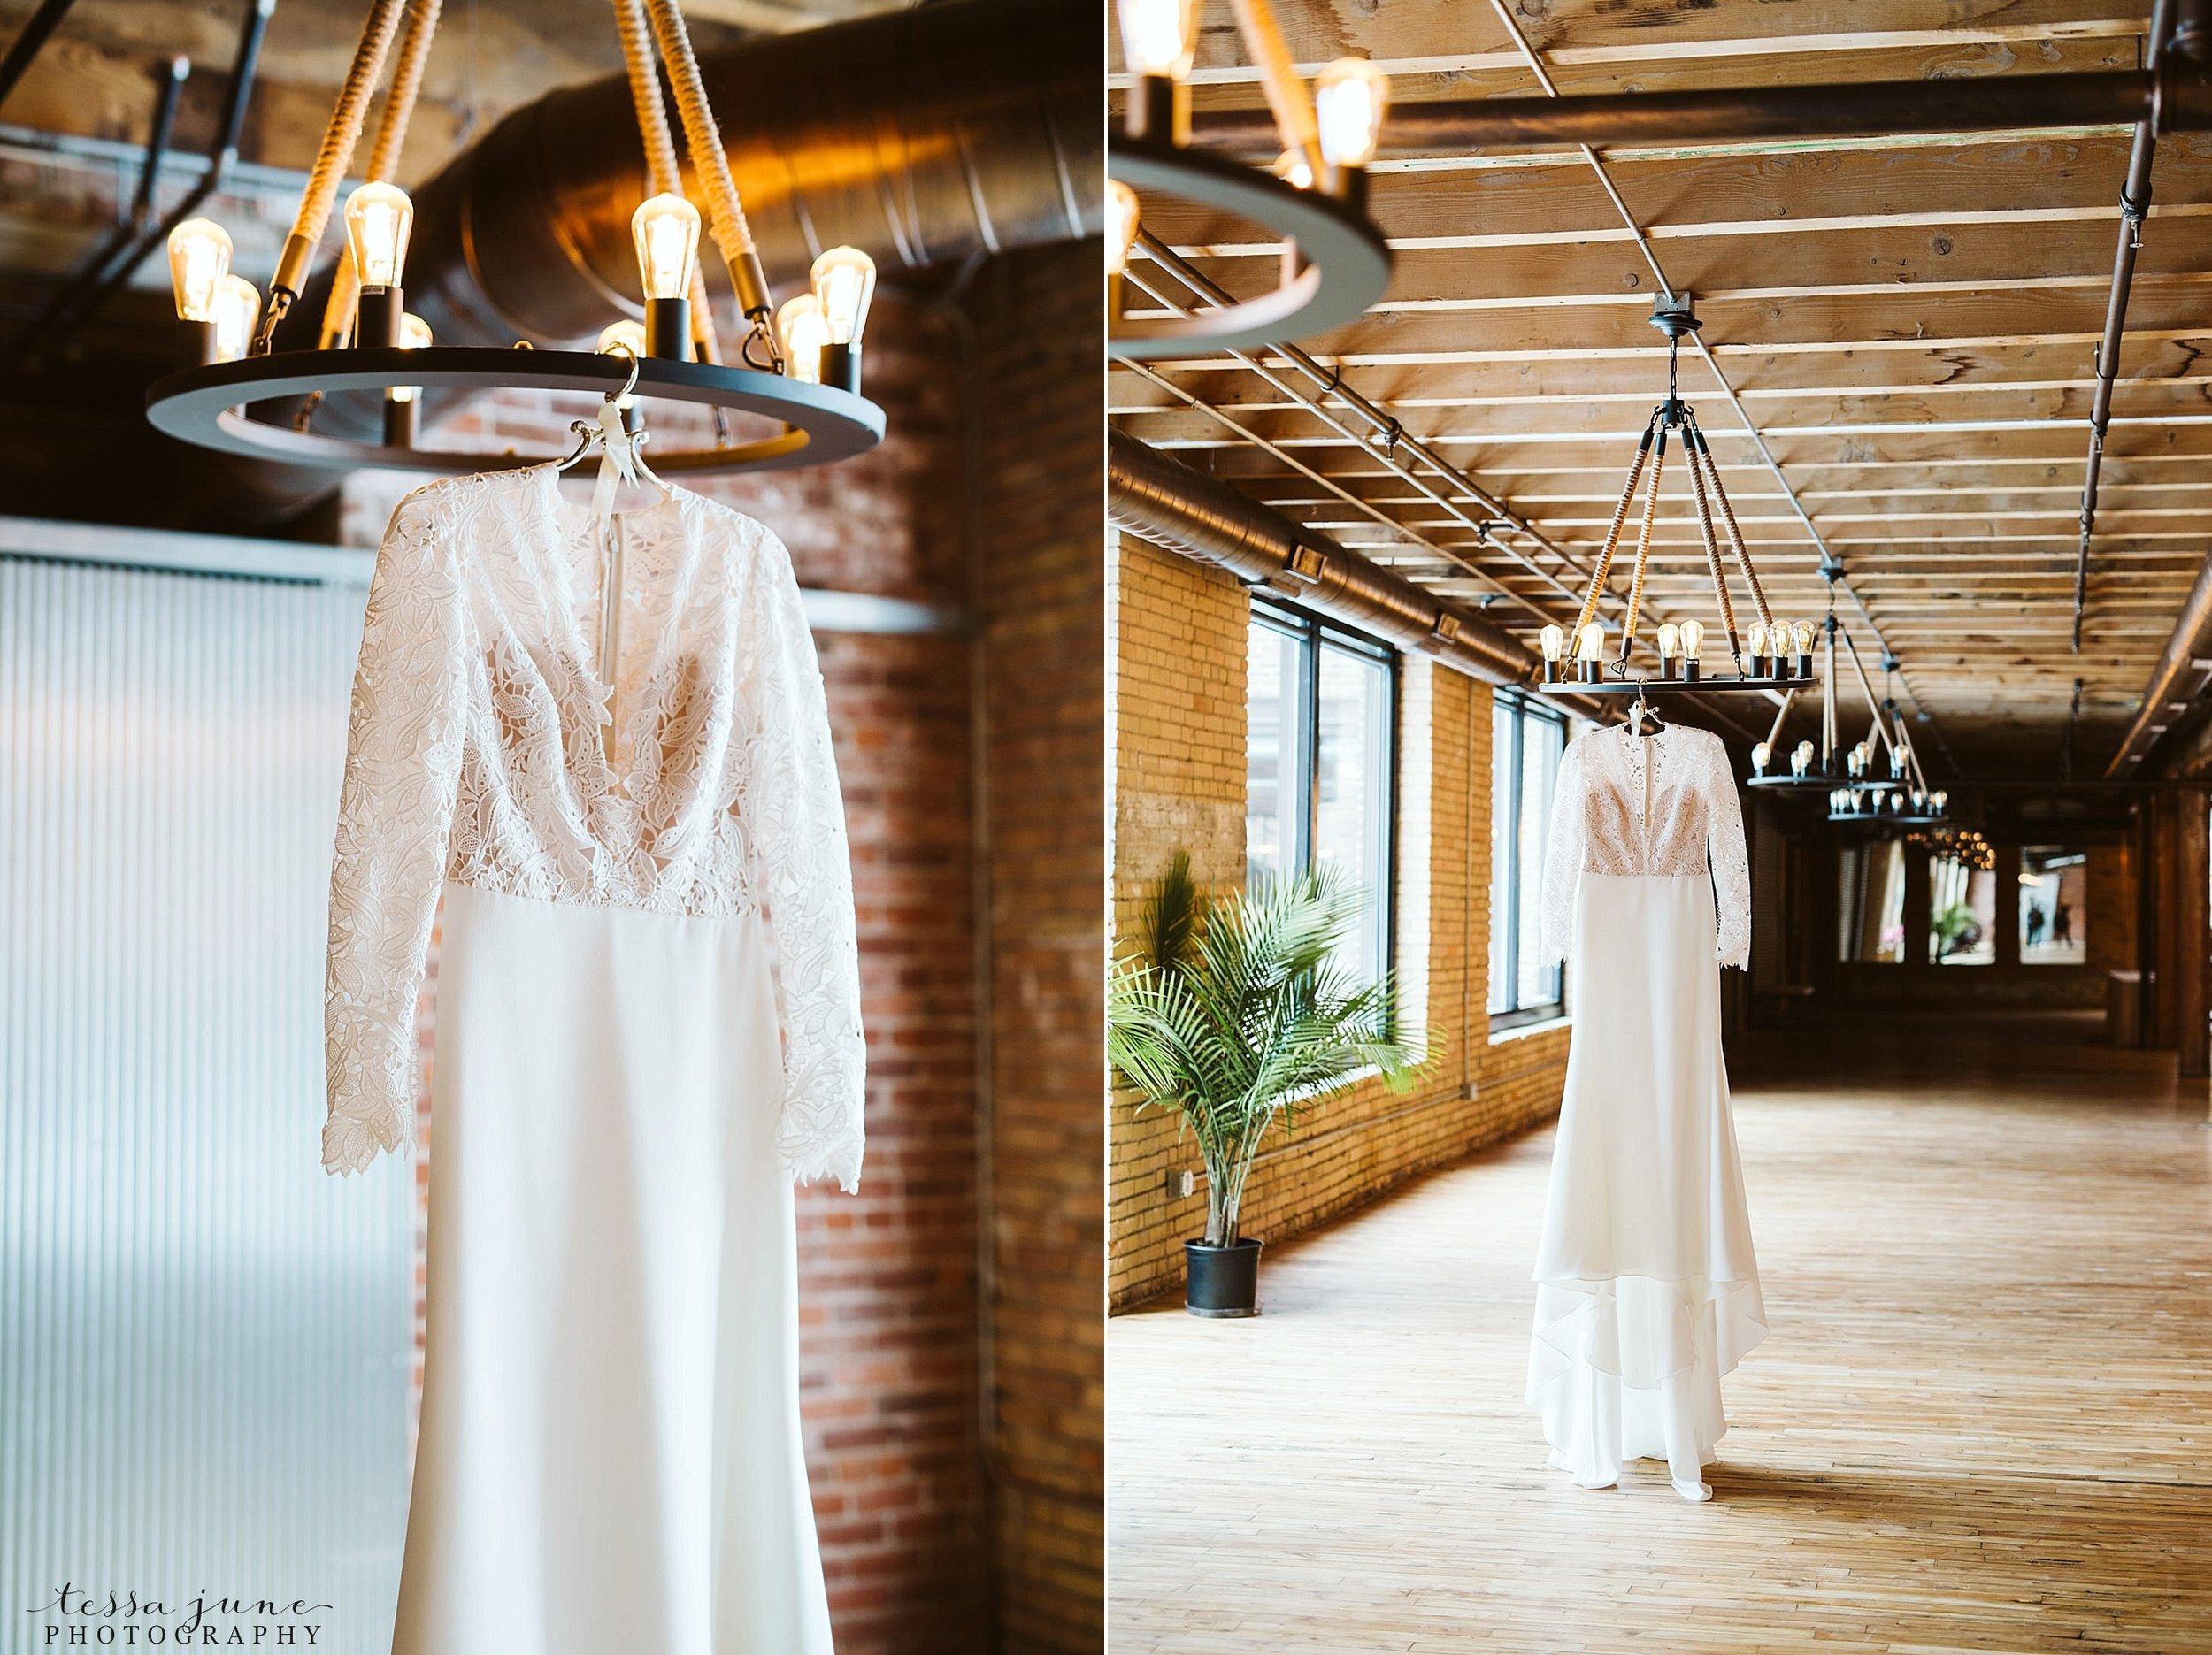 minneapolis-event-center-winter-romantic-snow-wedding-december-32.jpg